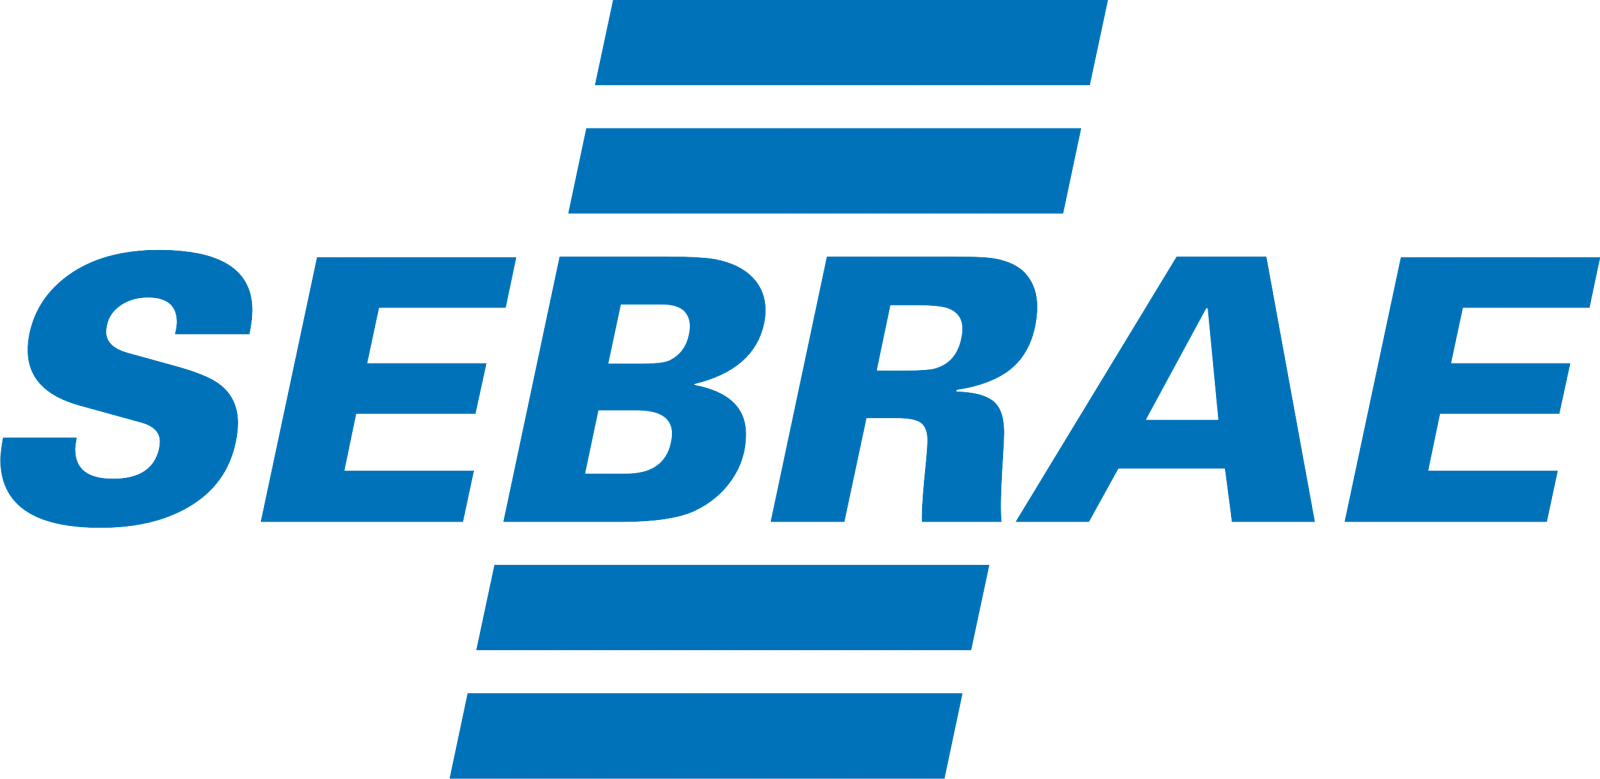 logotipo do Sebrae